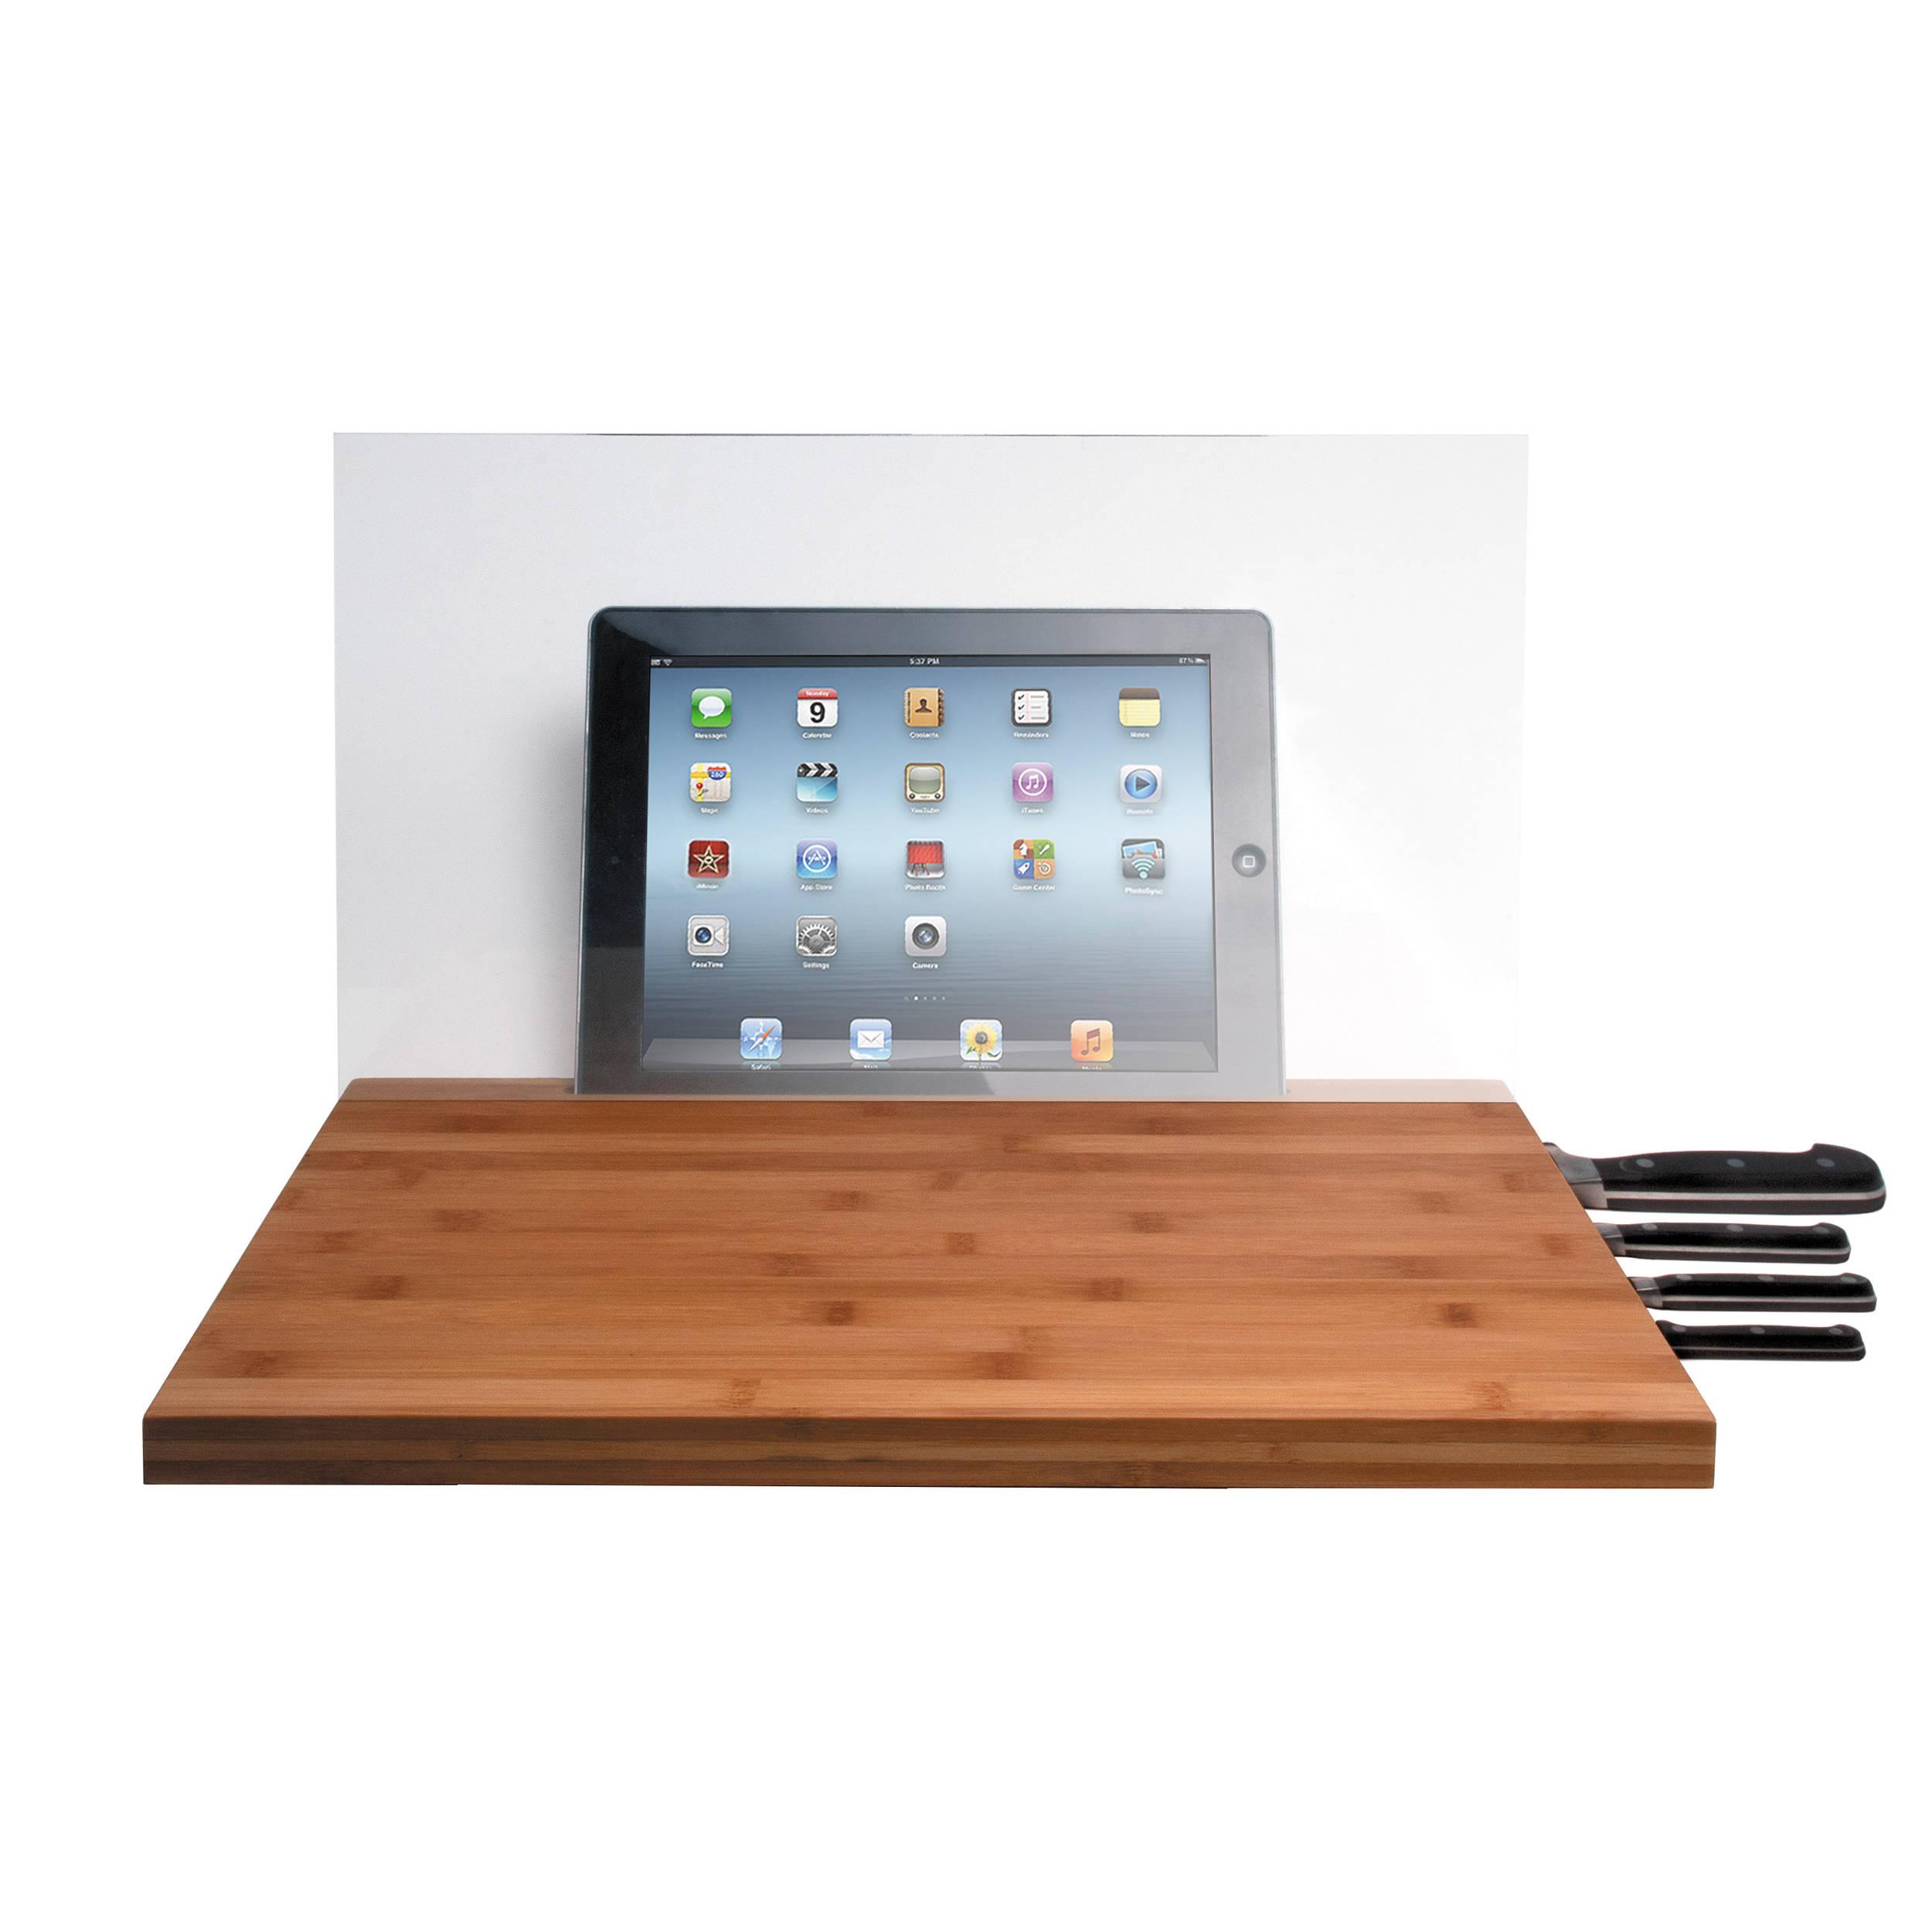 CTA Digital Bamboo Cutting Board For IPad